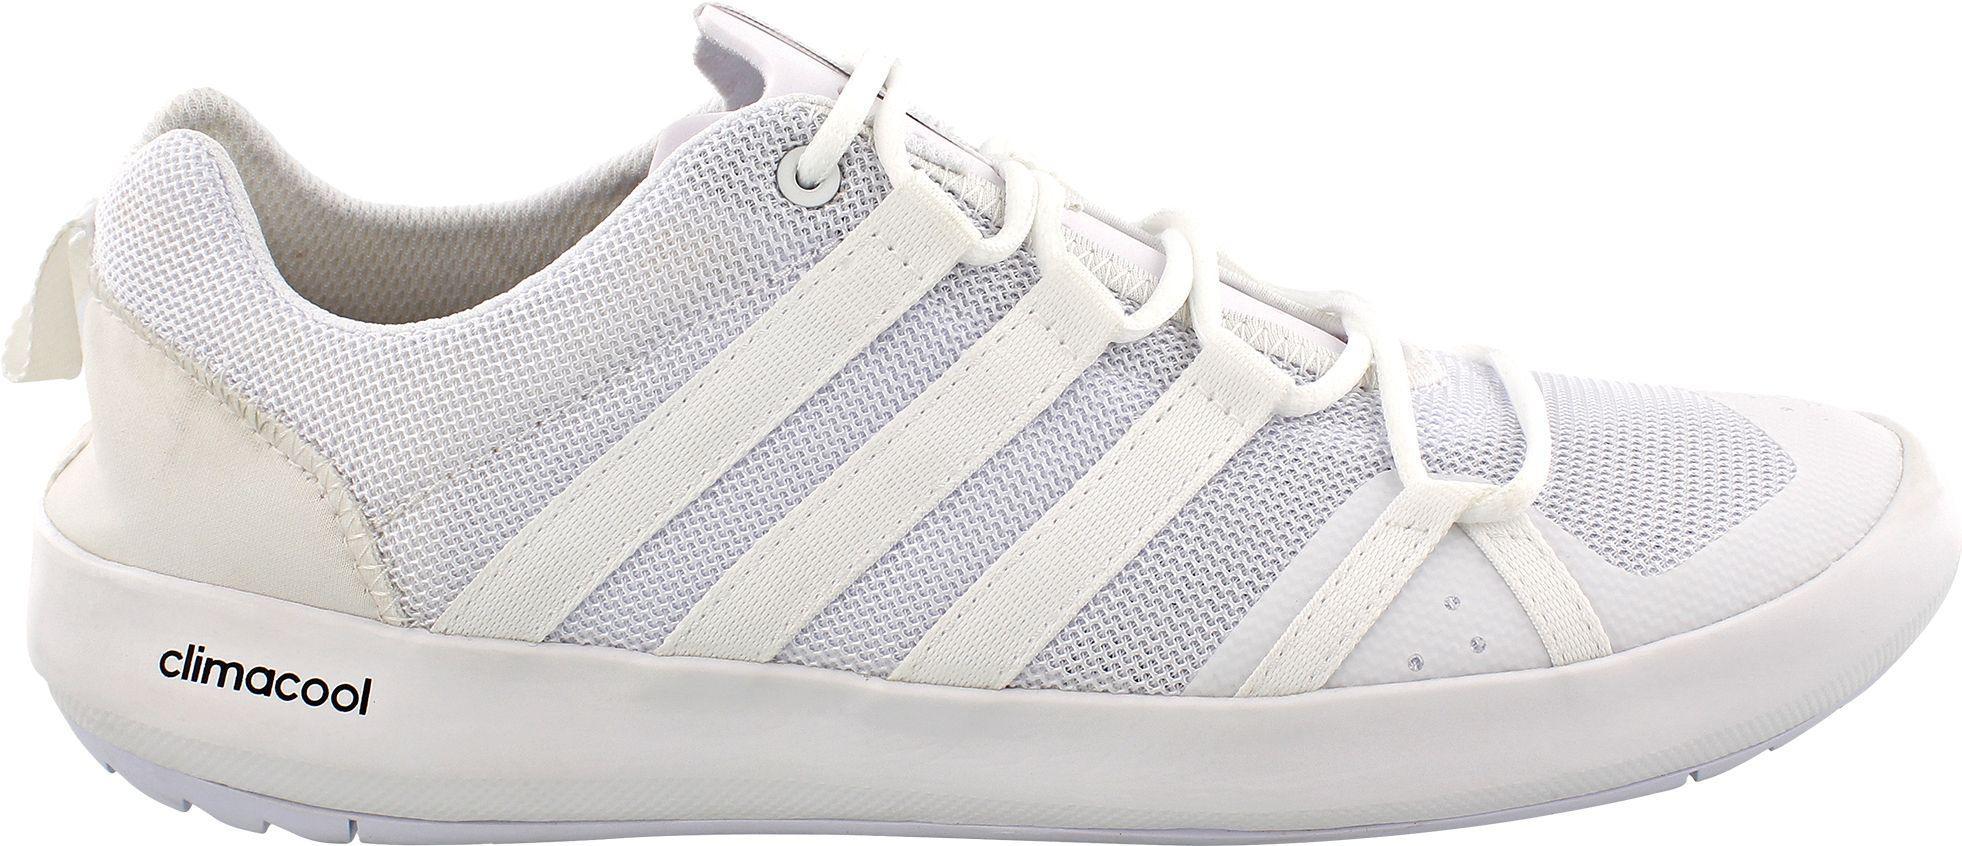 promo code 4d239 5147b Men's White Outdoor Terrex Climacool Boat Shoes